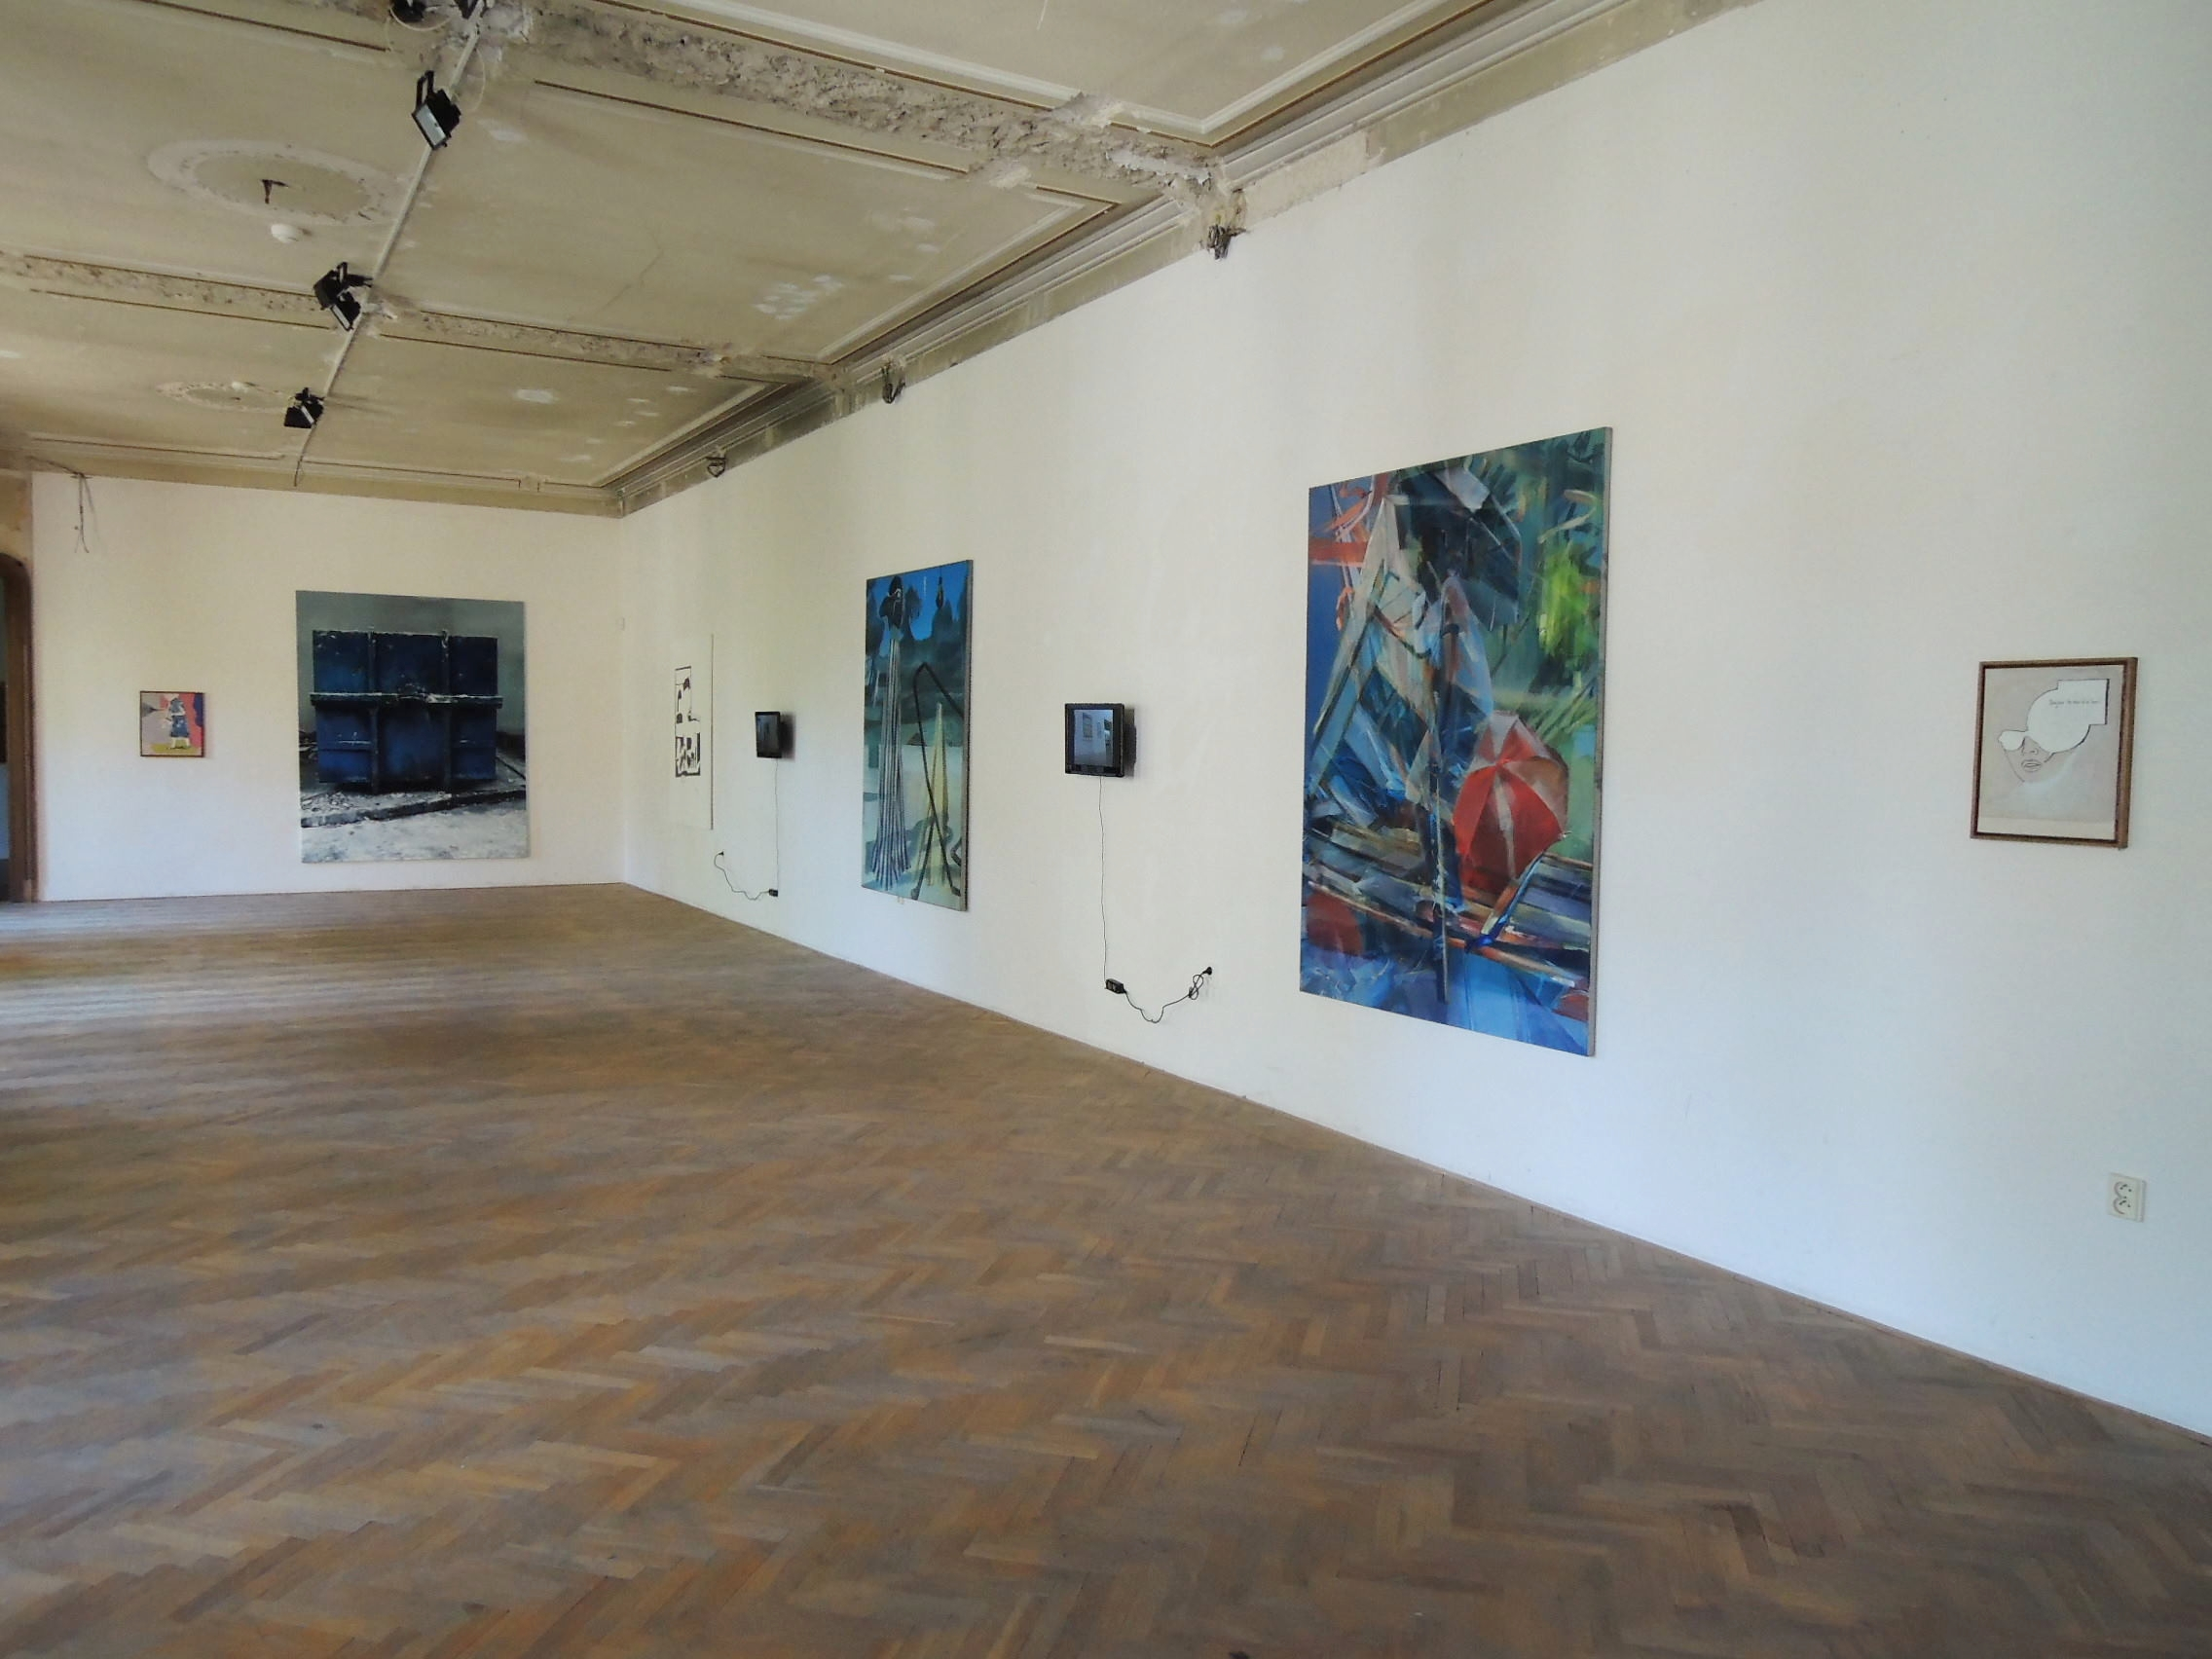 La Belle Peinture 2 , Bratislava (SK), Pisztory Palace.Curators : Eva Hober and Ivan Jançar.Artists in view: J.M Alberola, Youssef Kourichi, Ivan Argote, Marc Desgrandchamps, Duncan Wylie, J.M Alberola